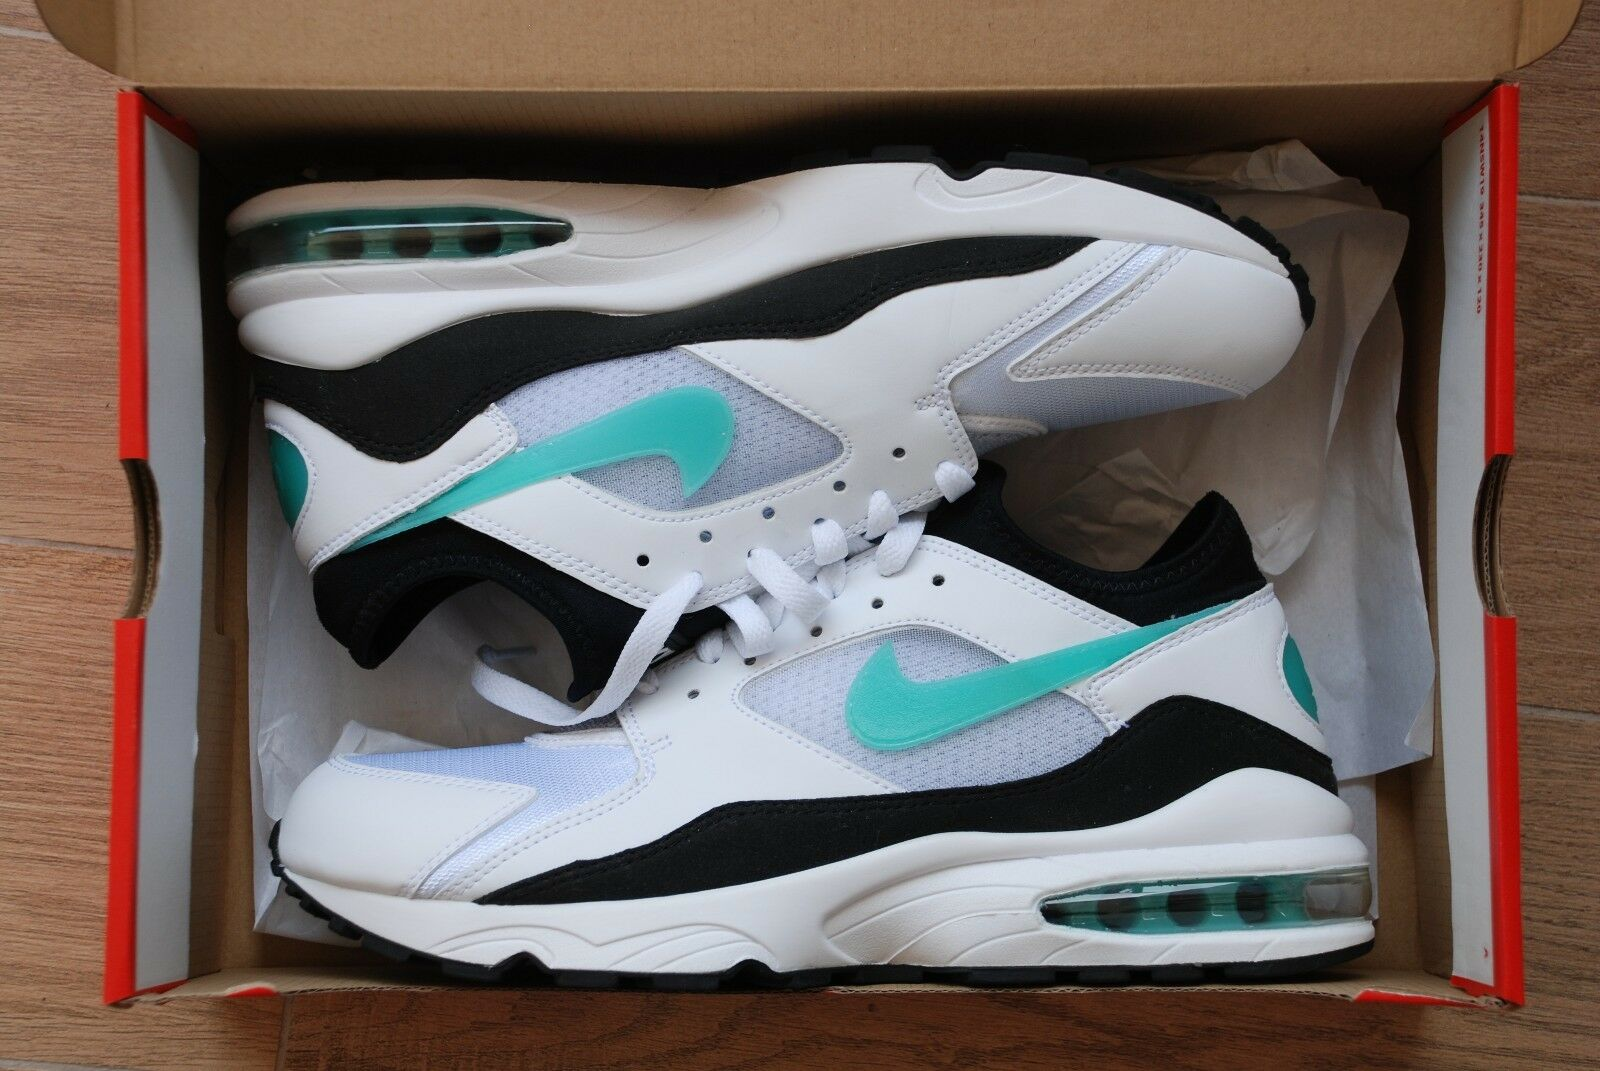 Nike air max 93 - misura 10 - 306551-107 nero dusty cactus retrò og Uomotolo qs